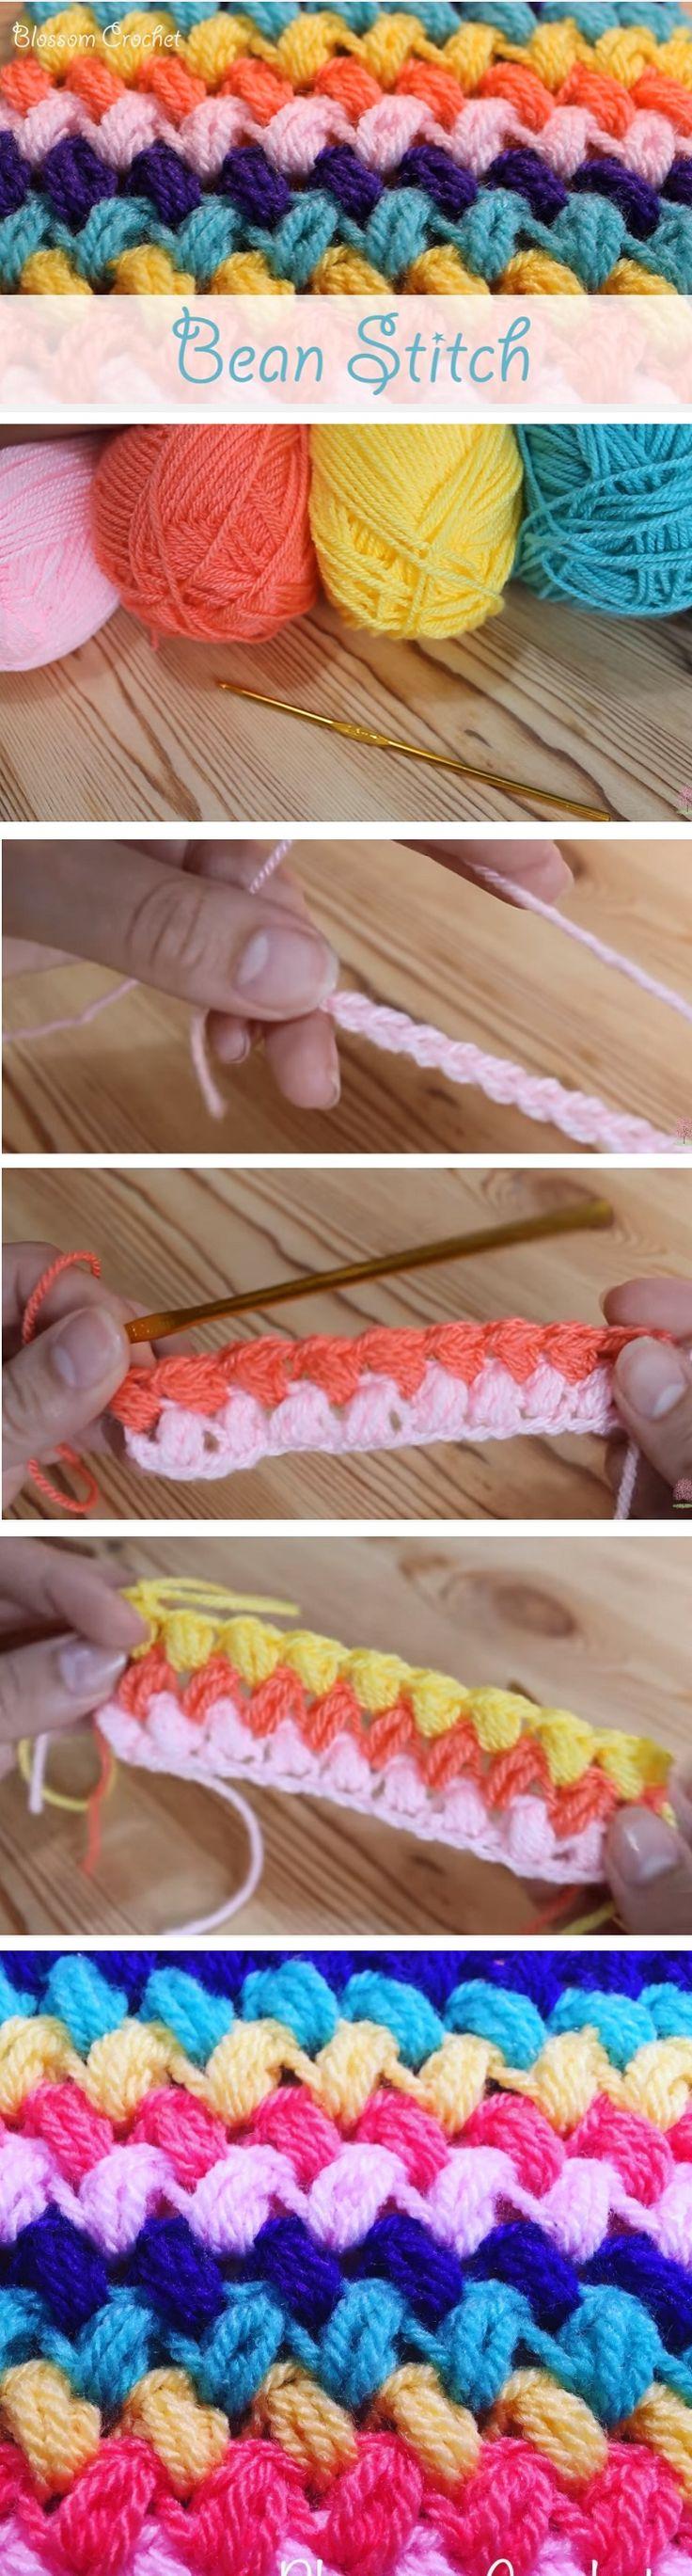 Bean Stitch Crochet Tutorial